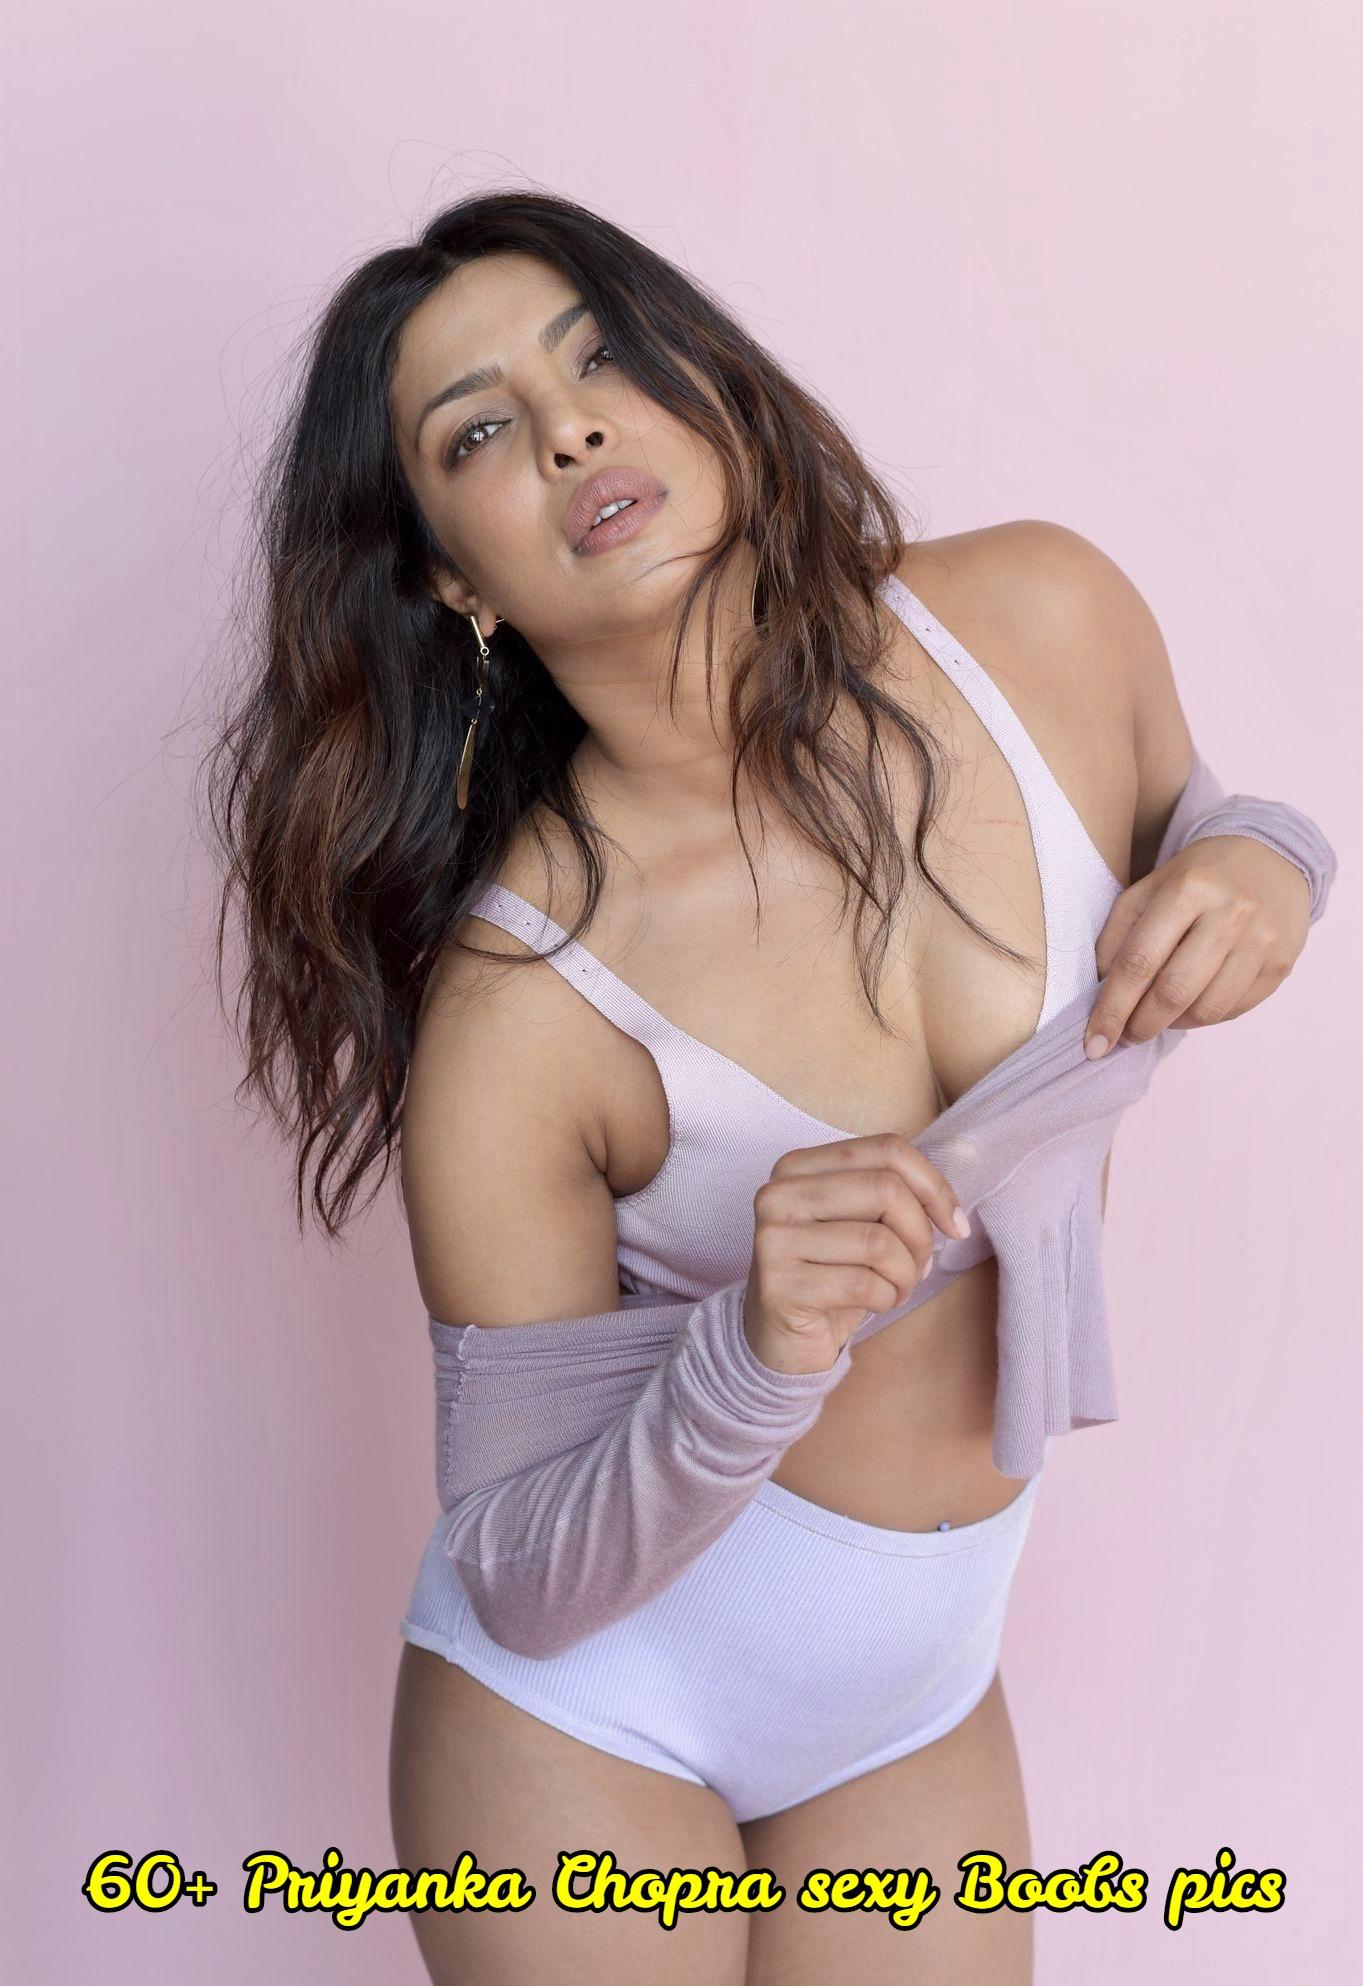 Priyanka Chopra sexy pictures